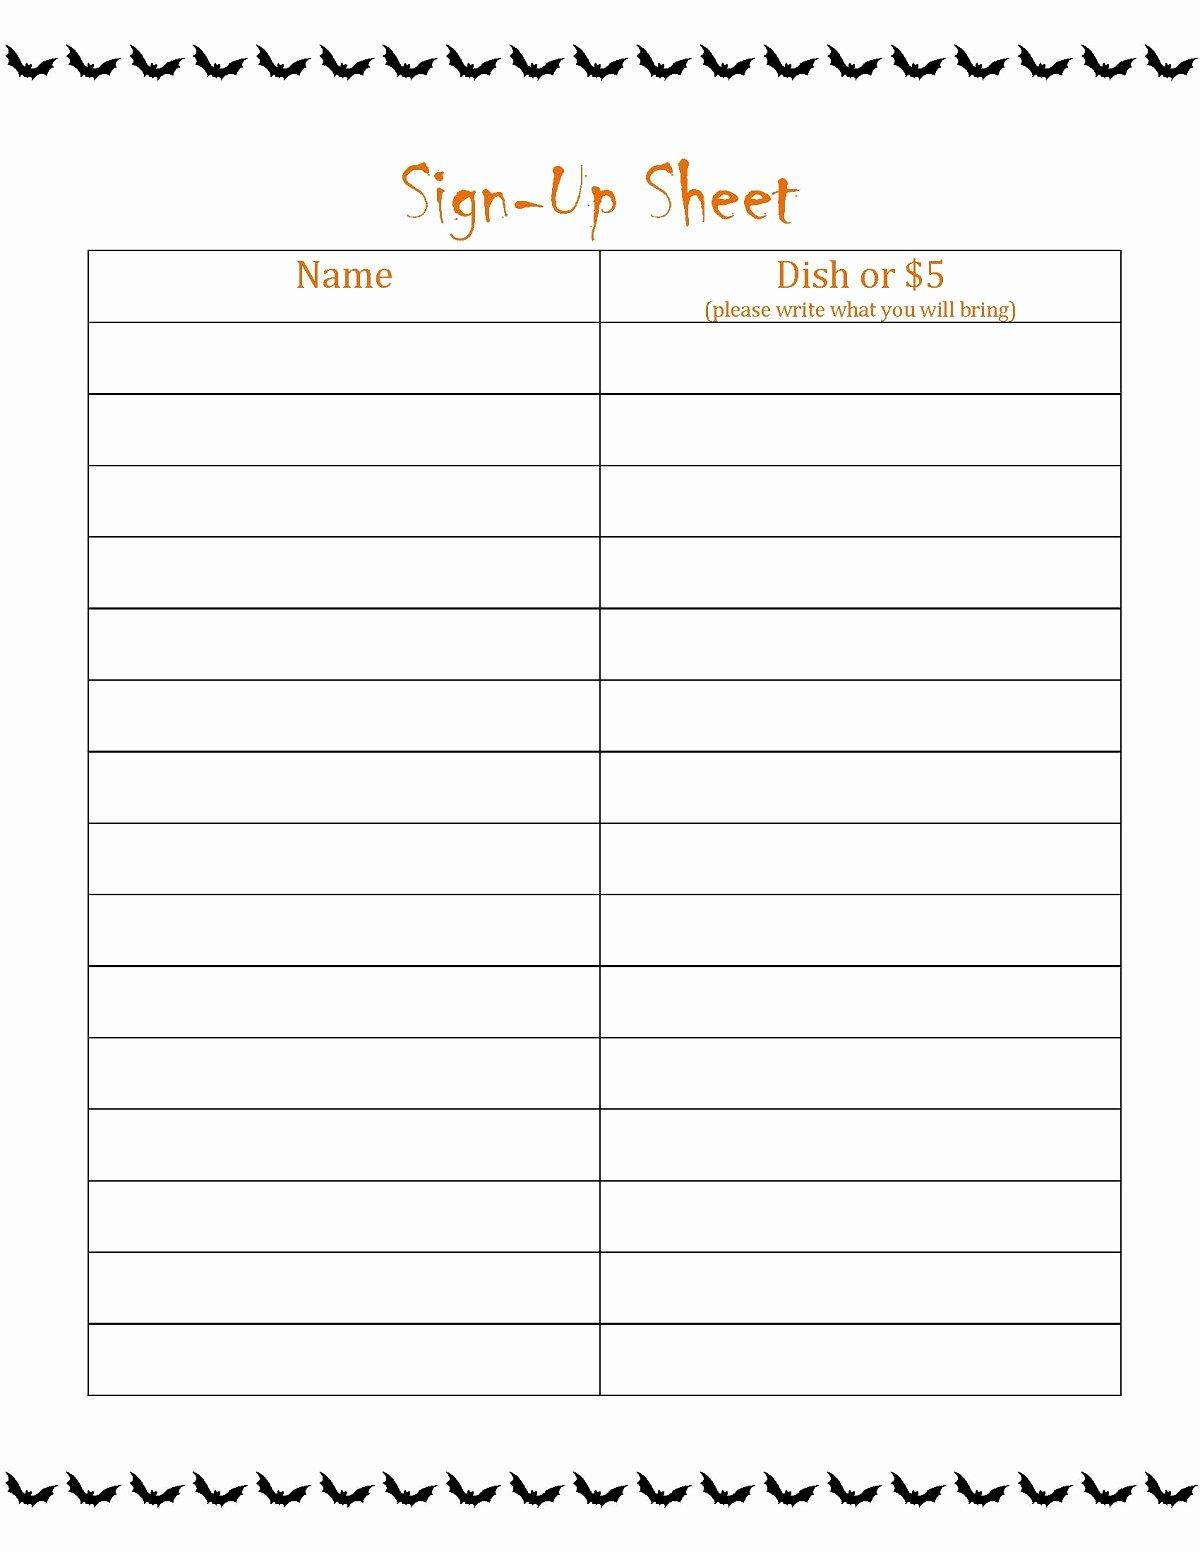 Printable Sign Up Sheet Template Elegant Free Printable Sign Up Sheet Printable